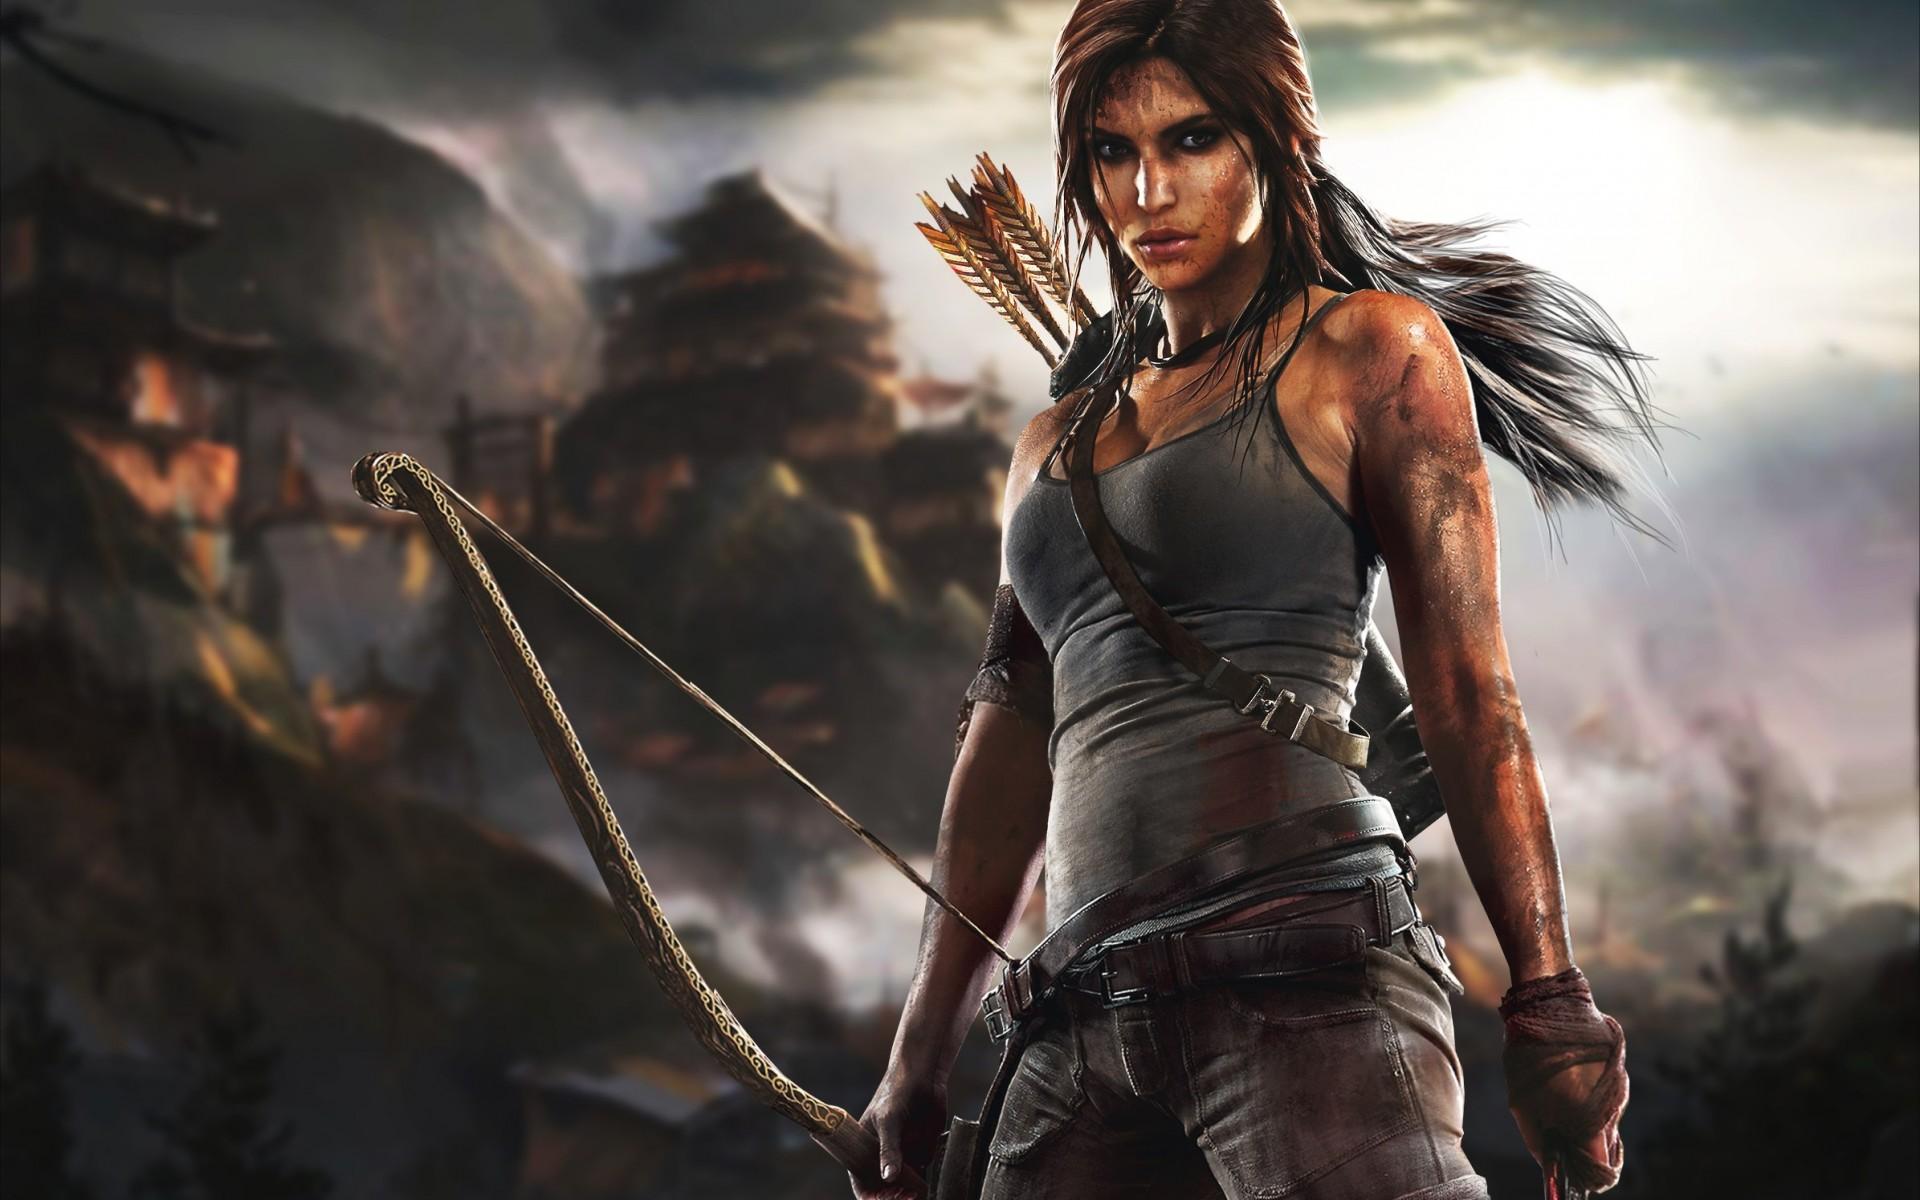 Lara Croft Adventure Wallpaper